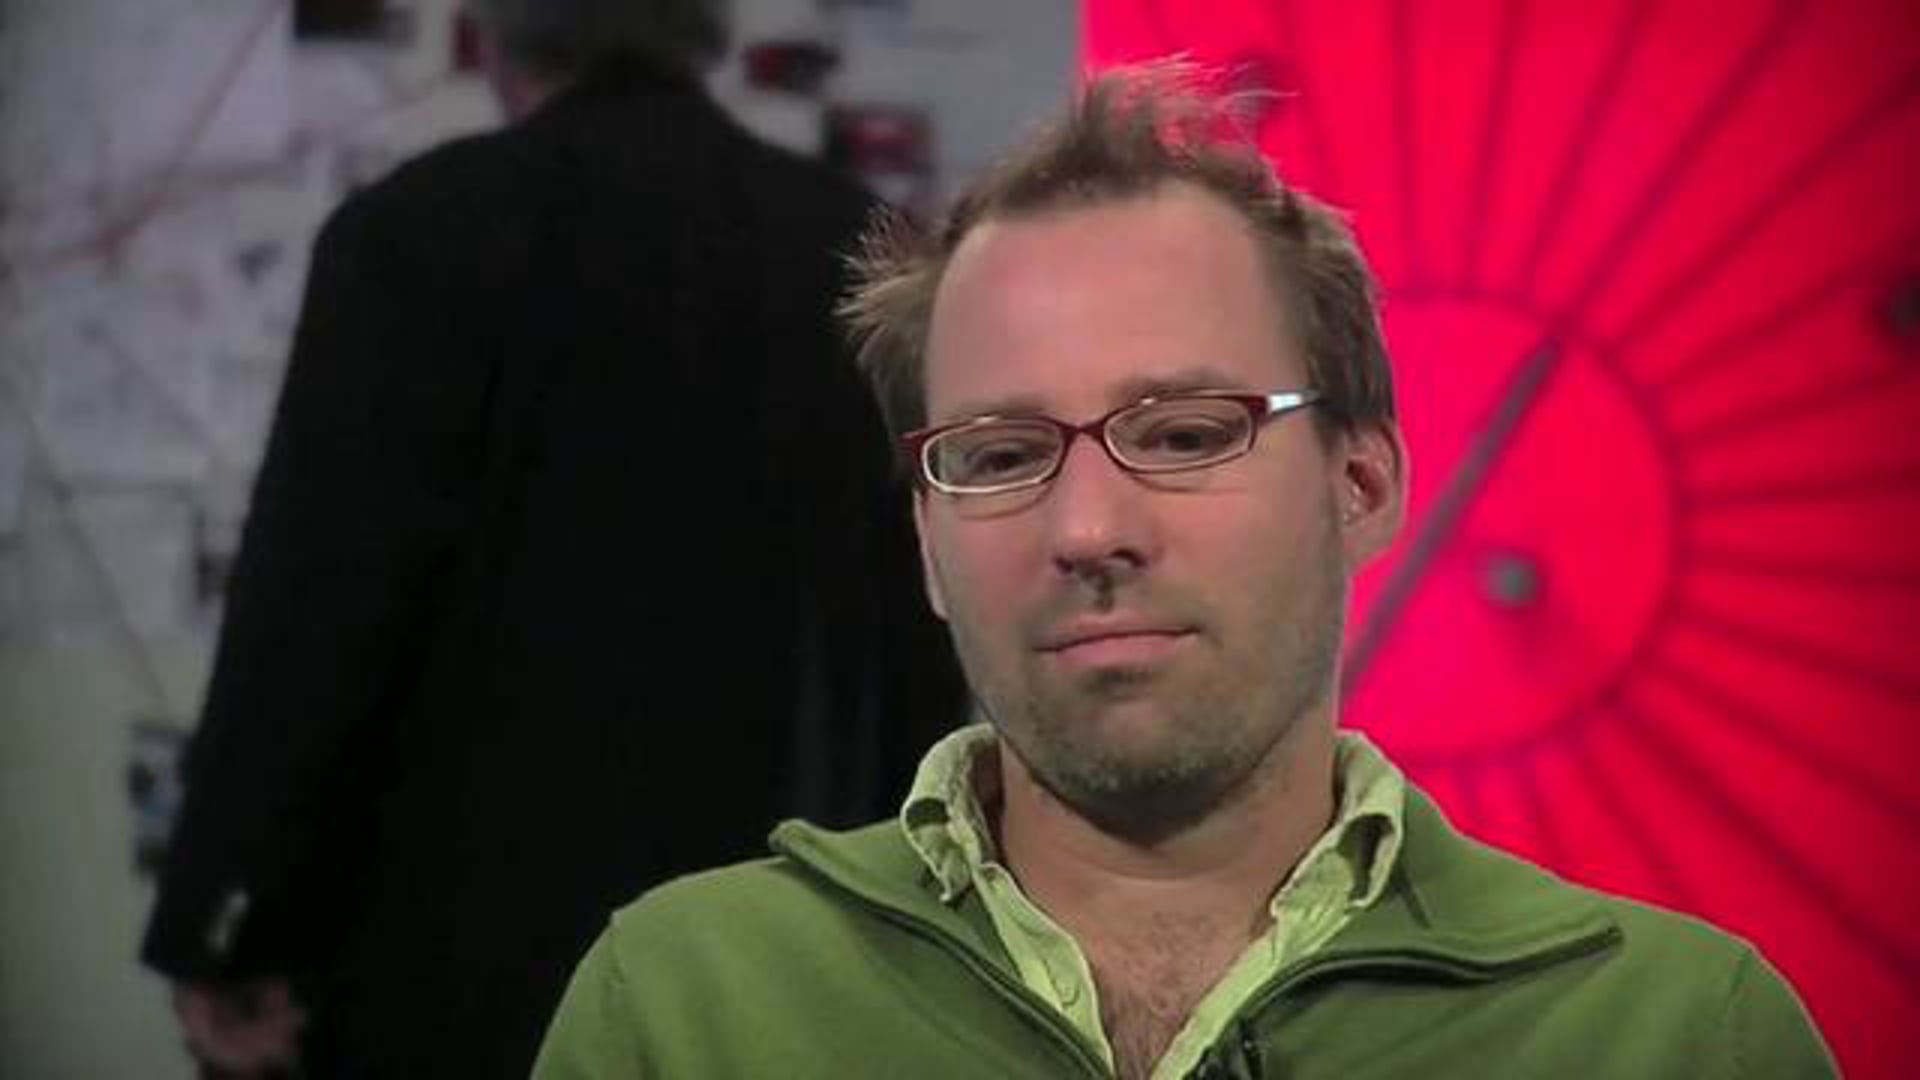 UICA interview with Kurt Perschke